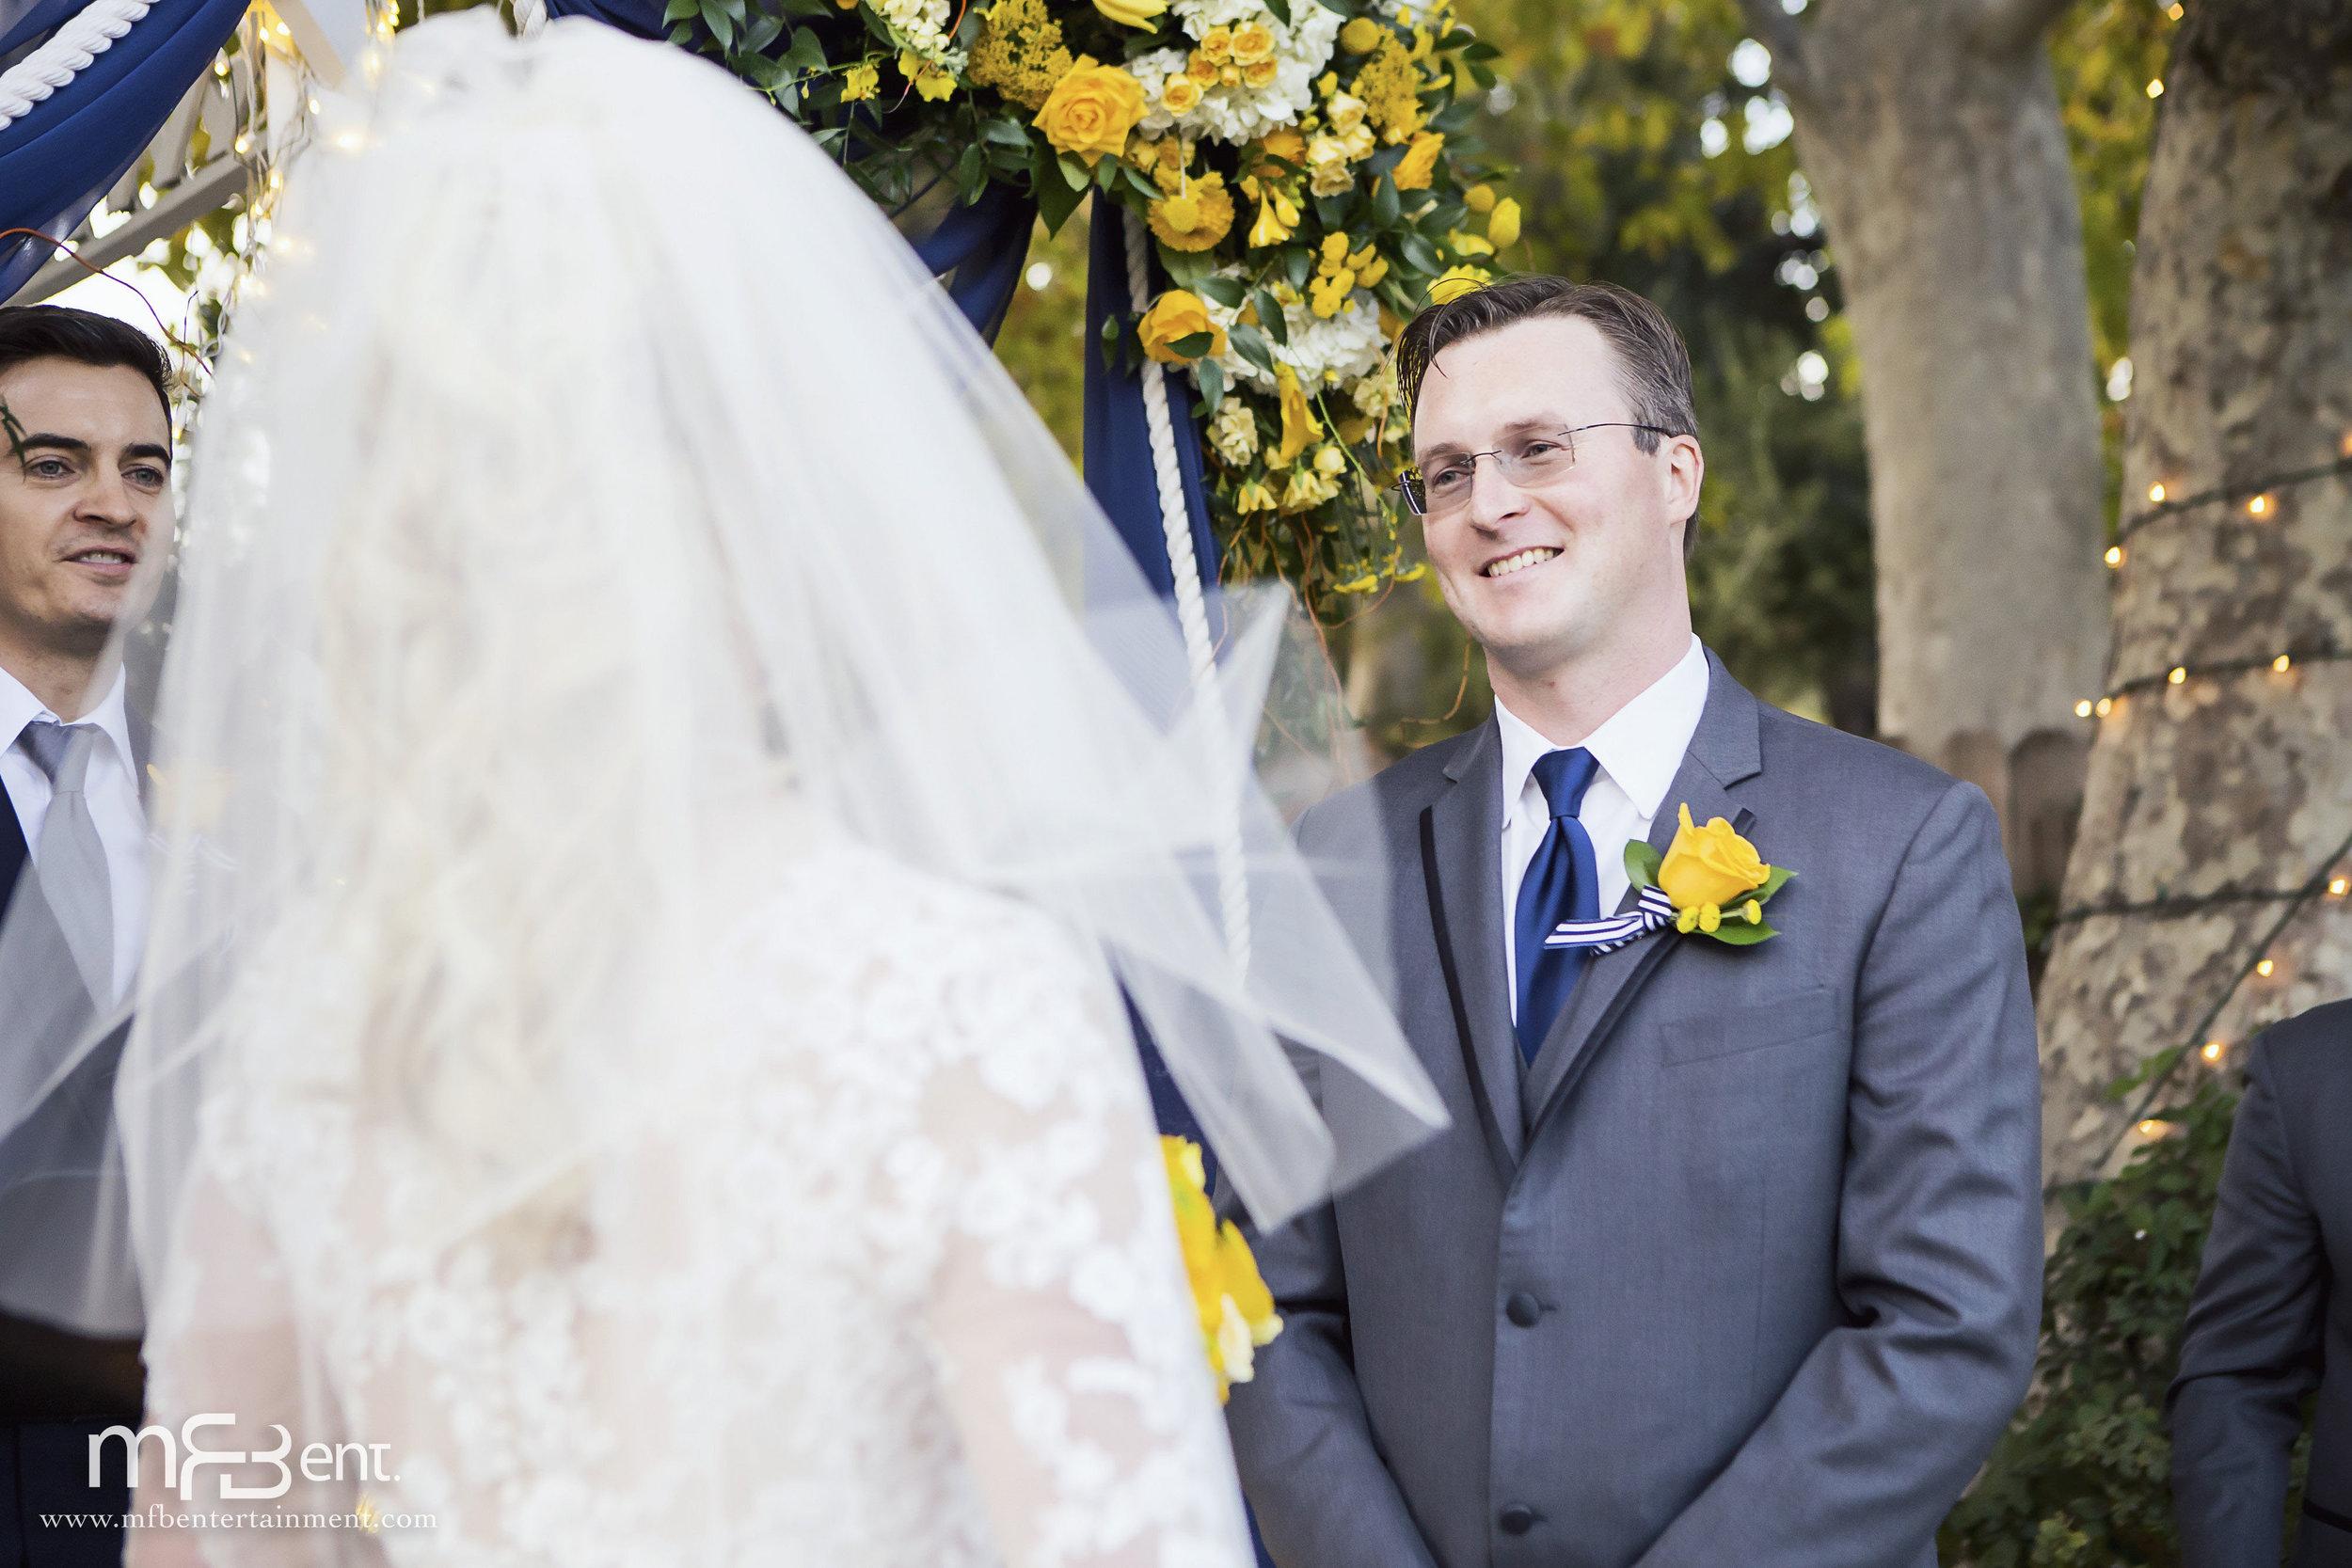 PIOTR CHELSEA WEDDING-CEREMONY-0083 L.jpg